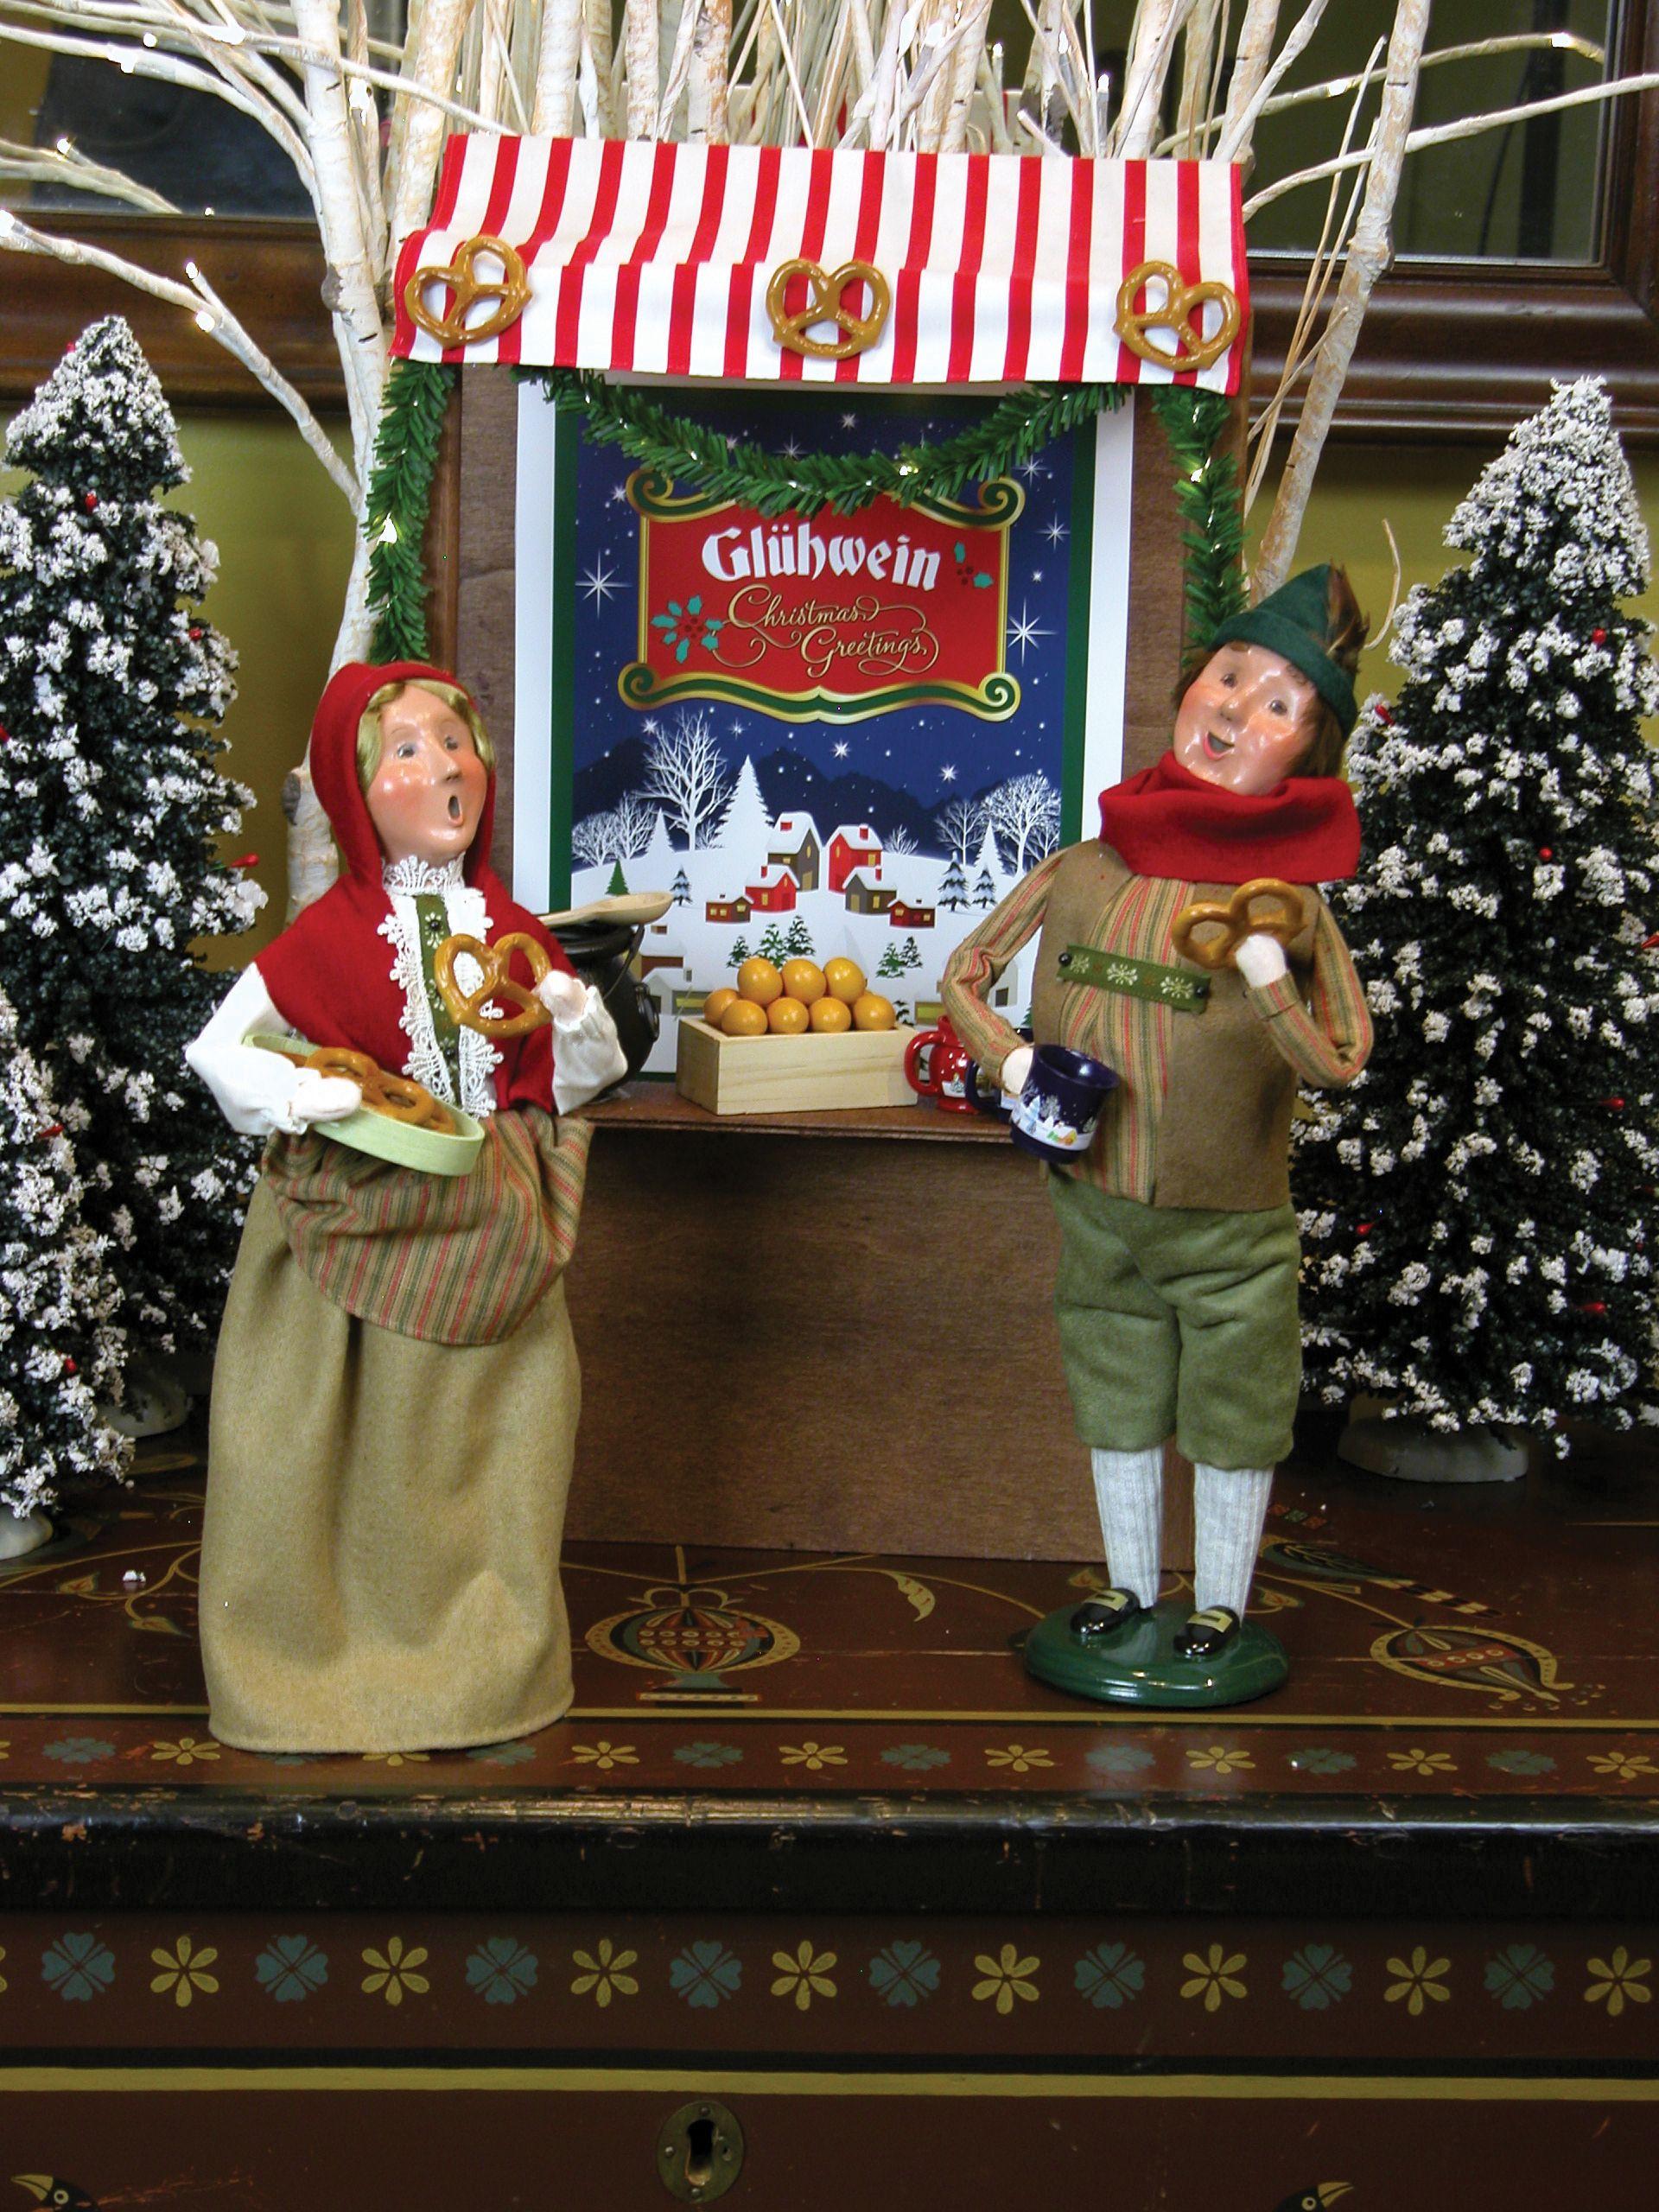 Christmas carolers figurines for sale - Byers Choice Caroler Figurines Bavarian Man Woman Lighted Bavarian Market Stall